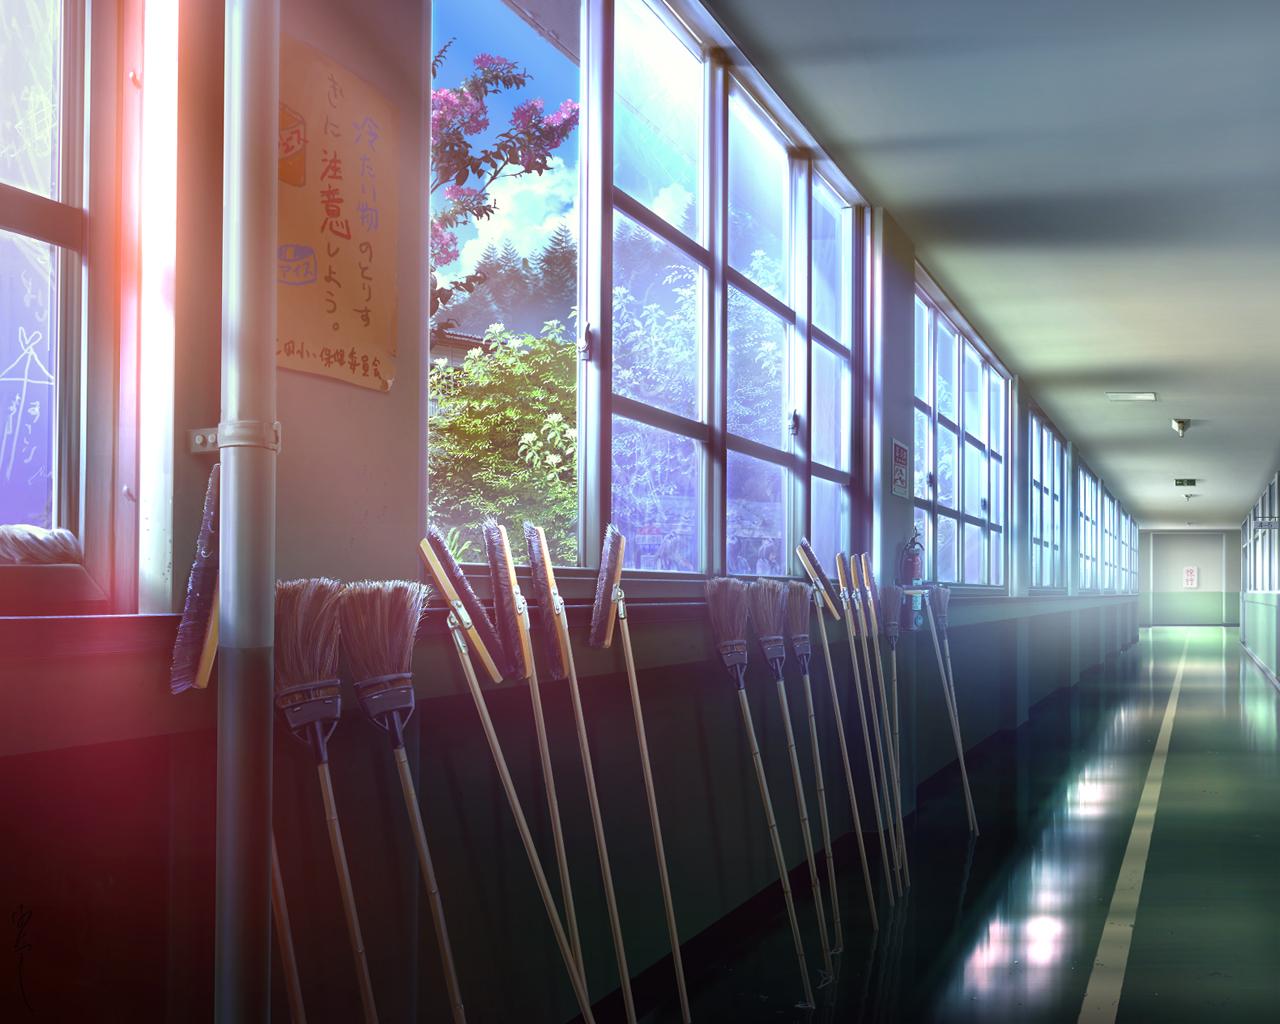 Pixiv id 843445 wallpaper 957554 zerochan anime image board - Wallpaper corridor ...